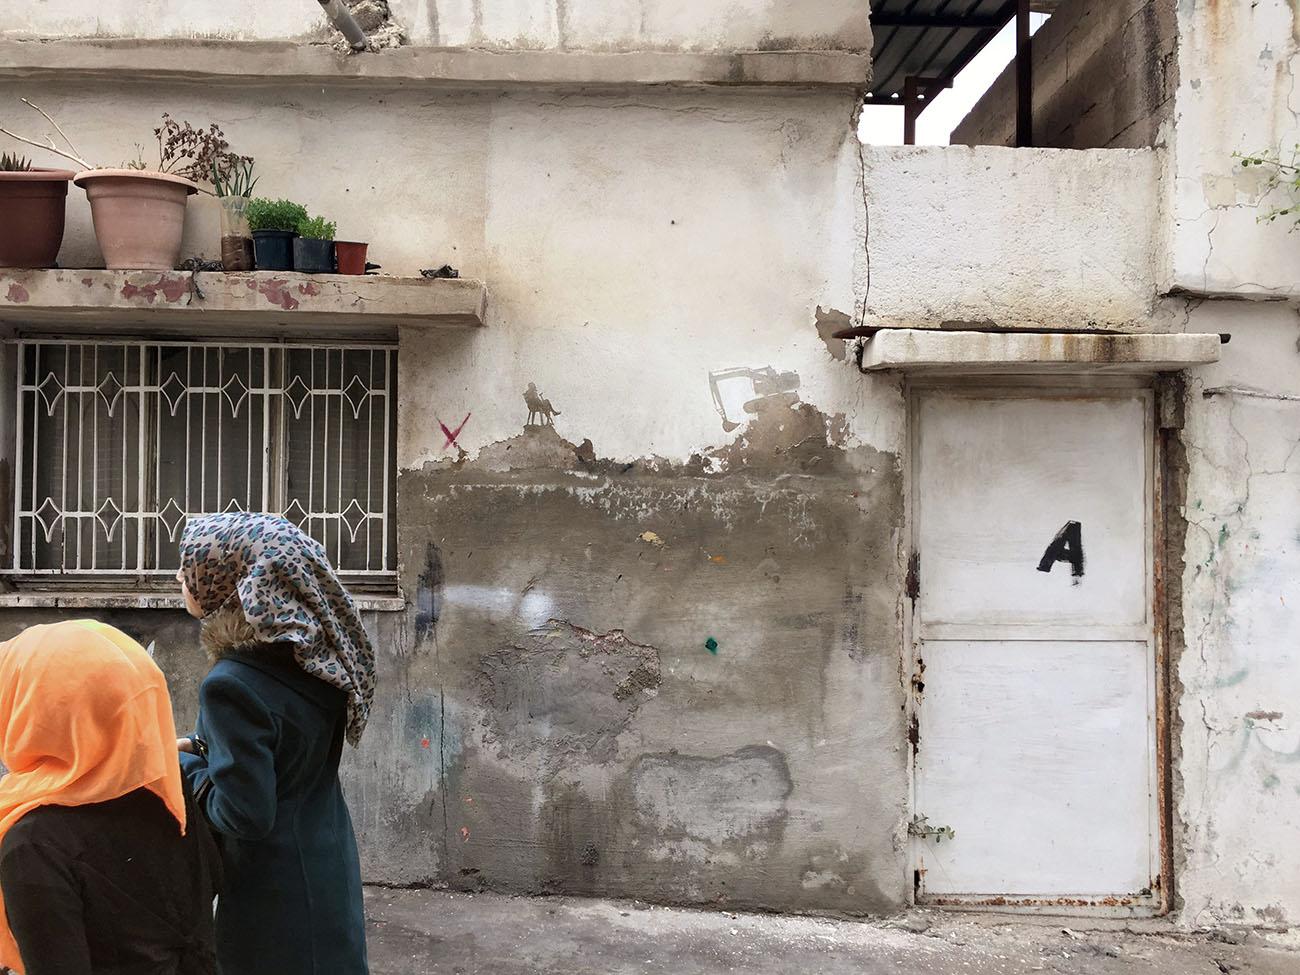 PEJAC: 'Throne', Al-Hussein, Palestine Refugee Camp | Amman, Jordan | 2016